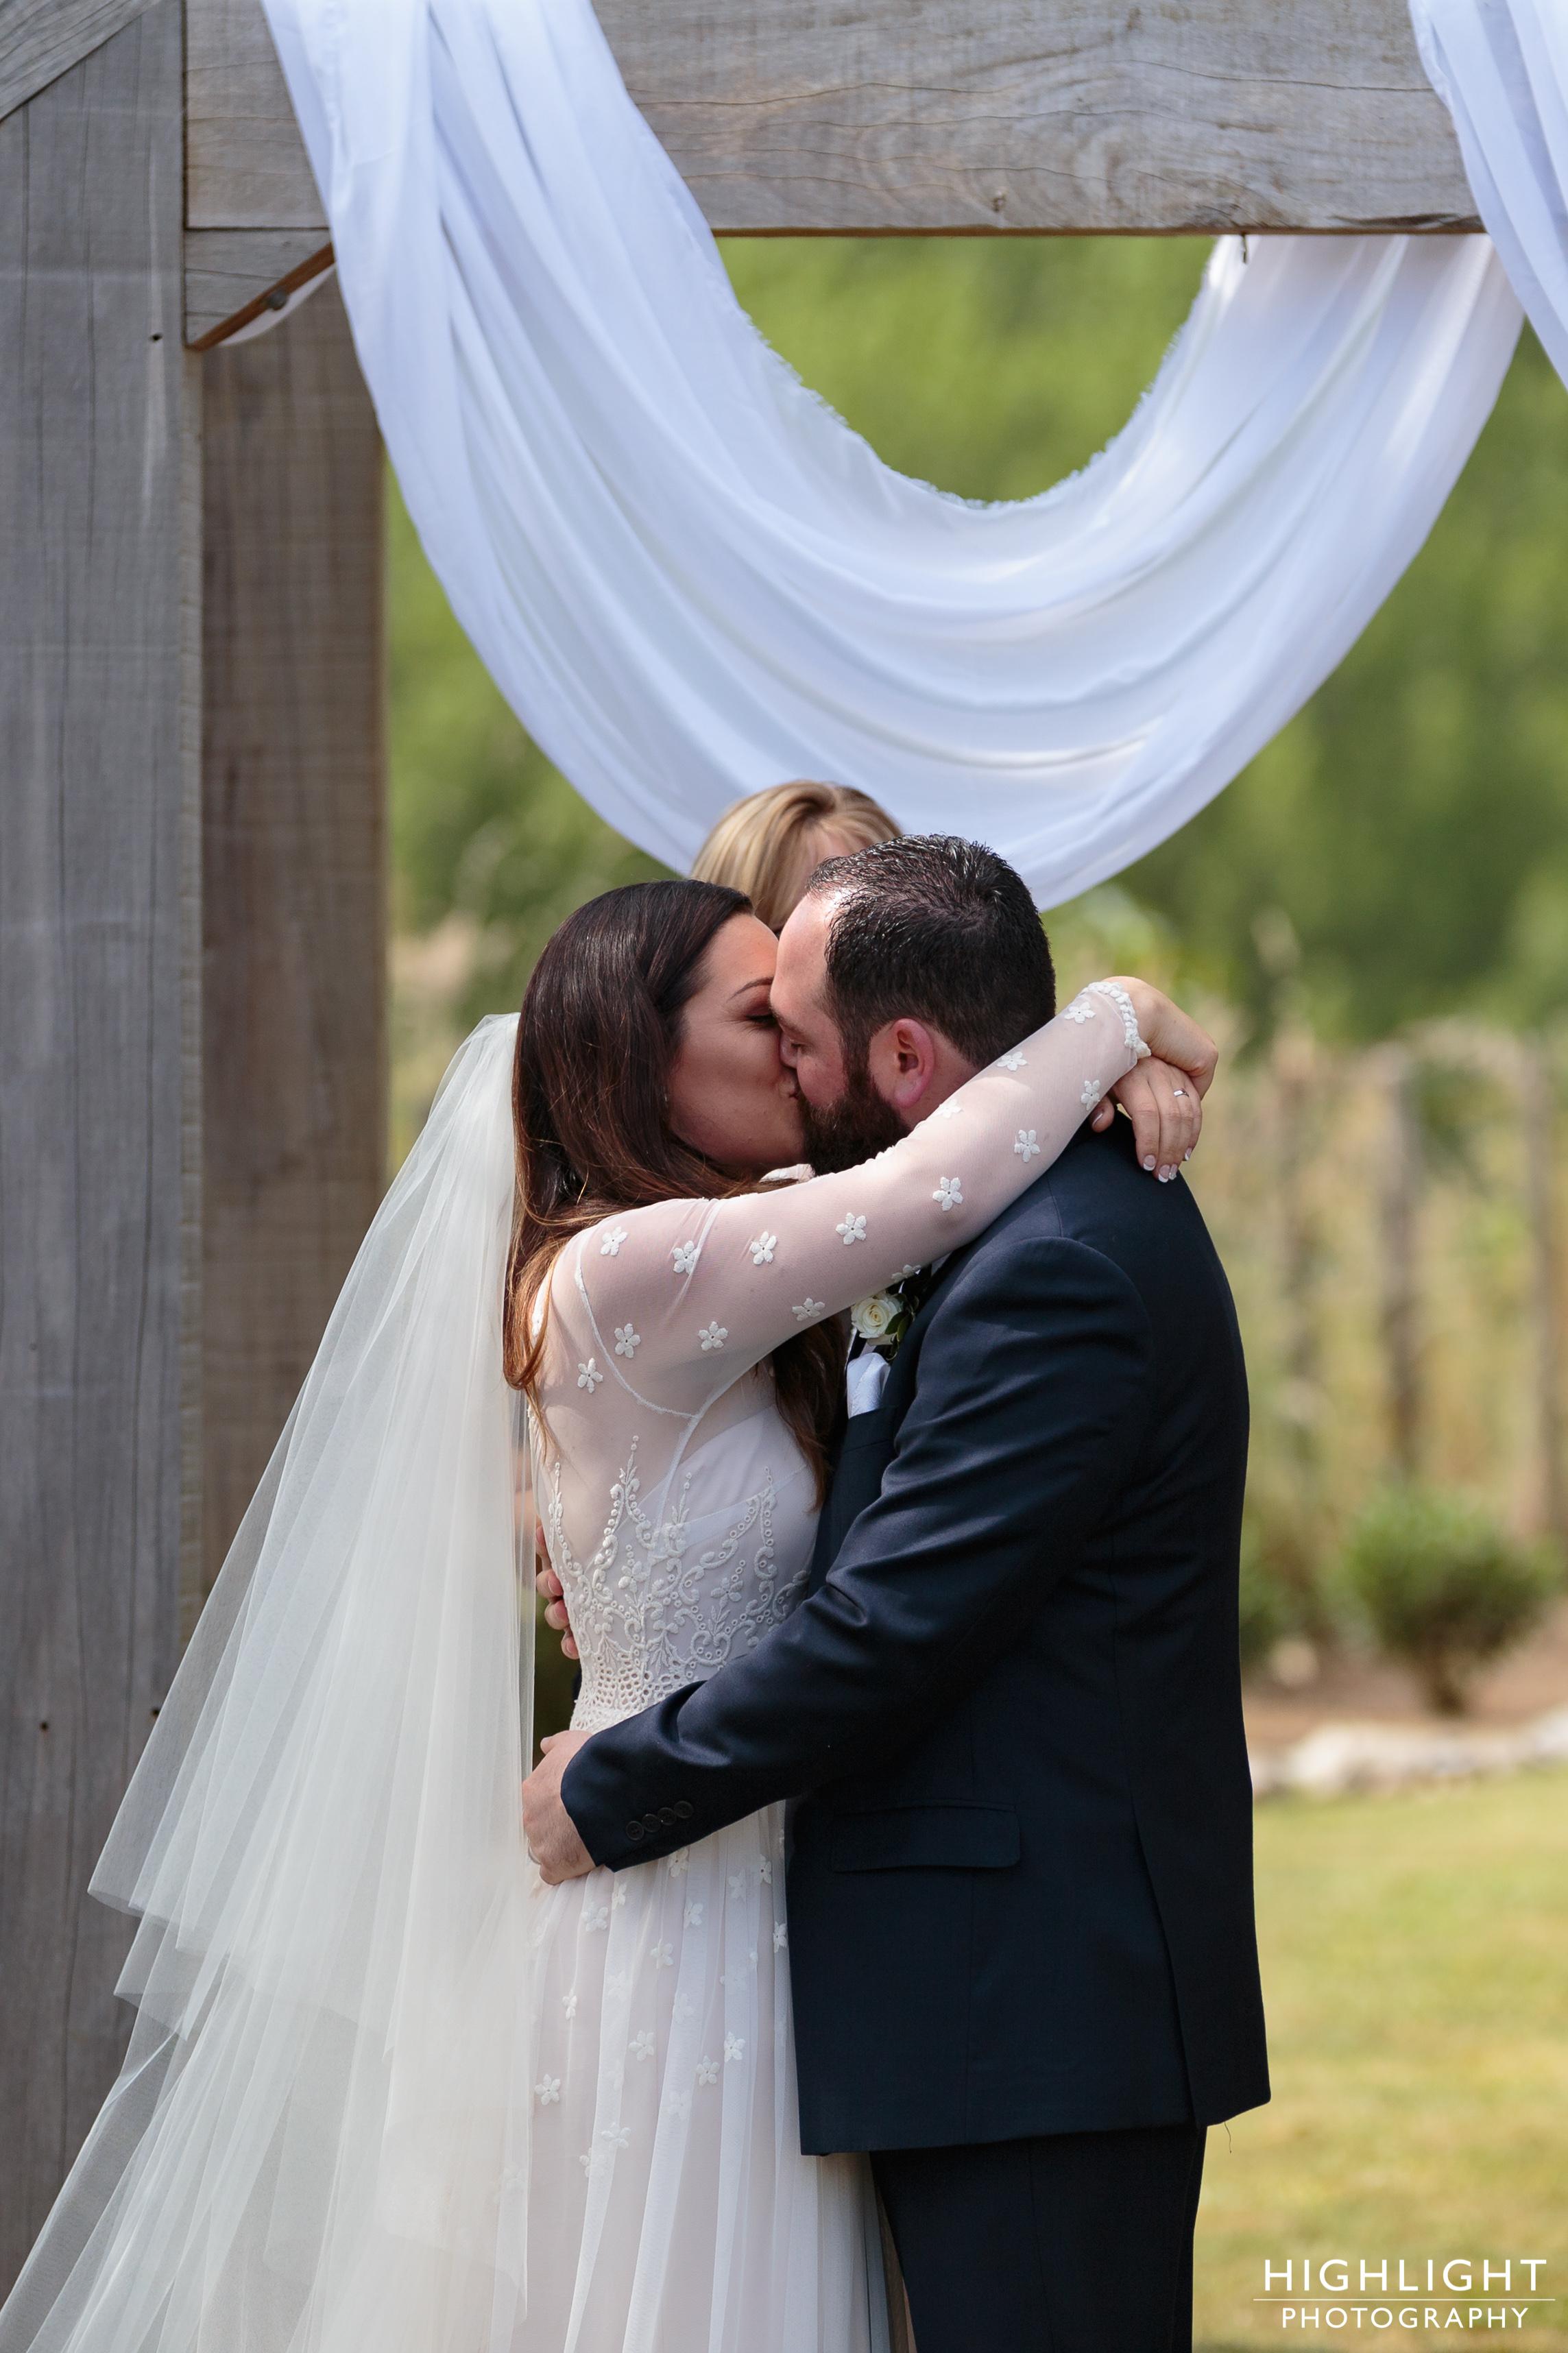 highlight-wedding-photography-new-zealand-makoura-lodge-wedding-84.jpgmakoura_lodge_highlight_photography_manawatu_wedding_photographer